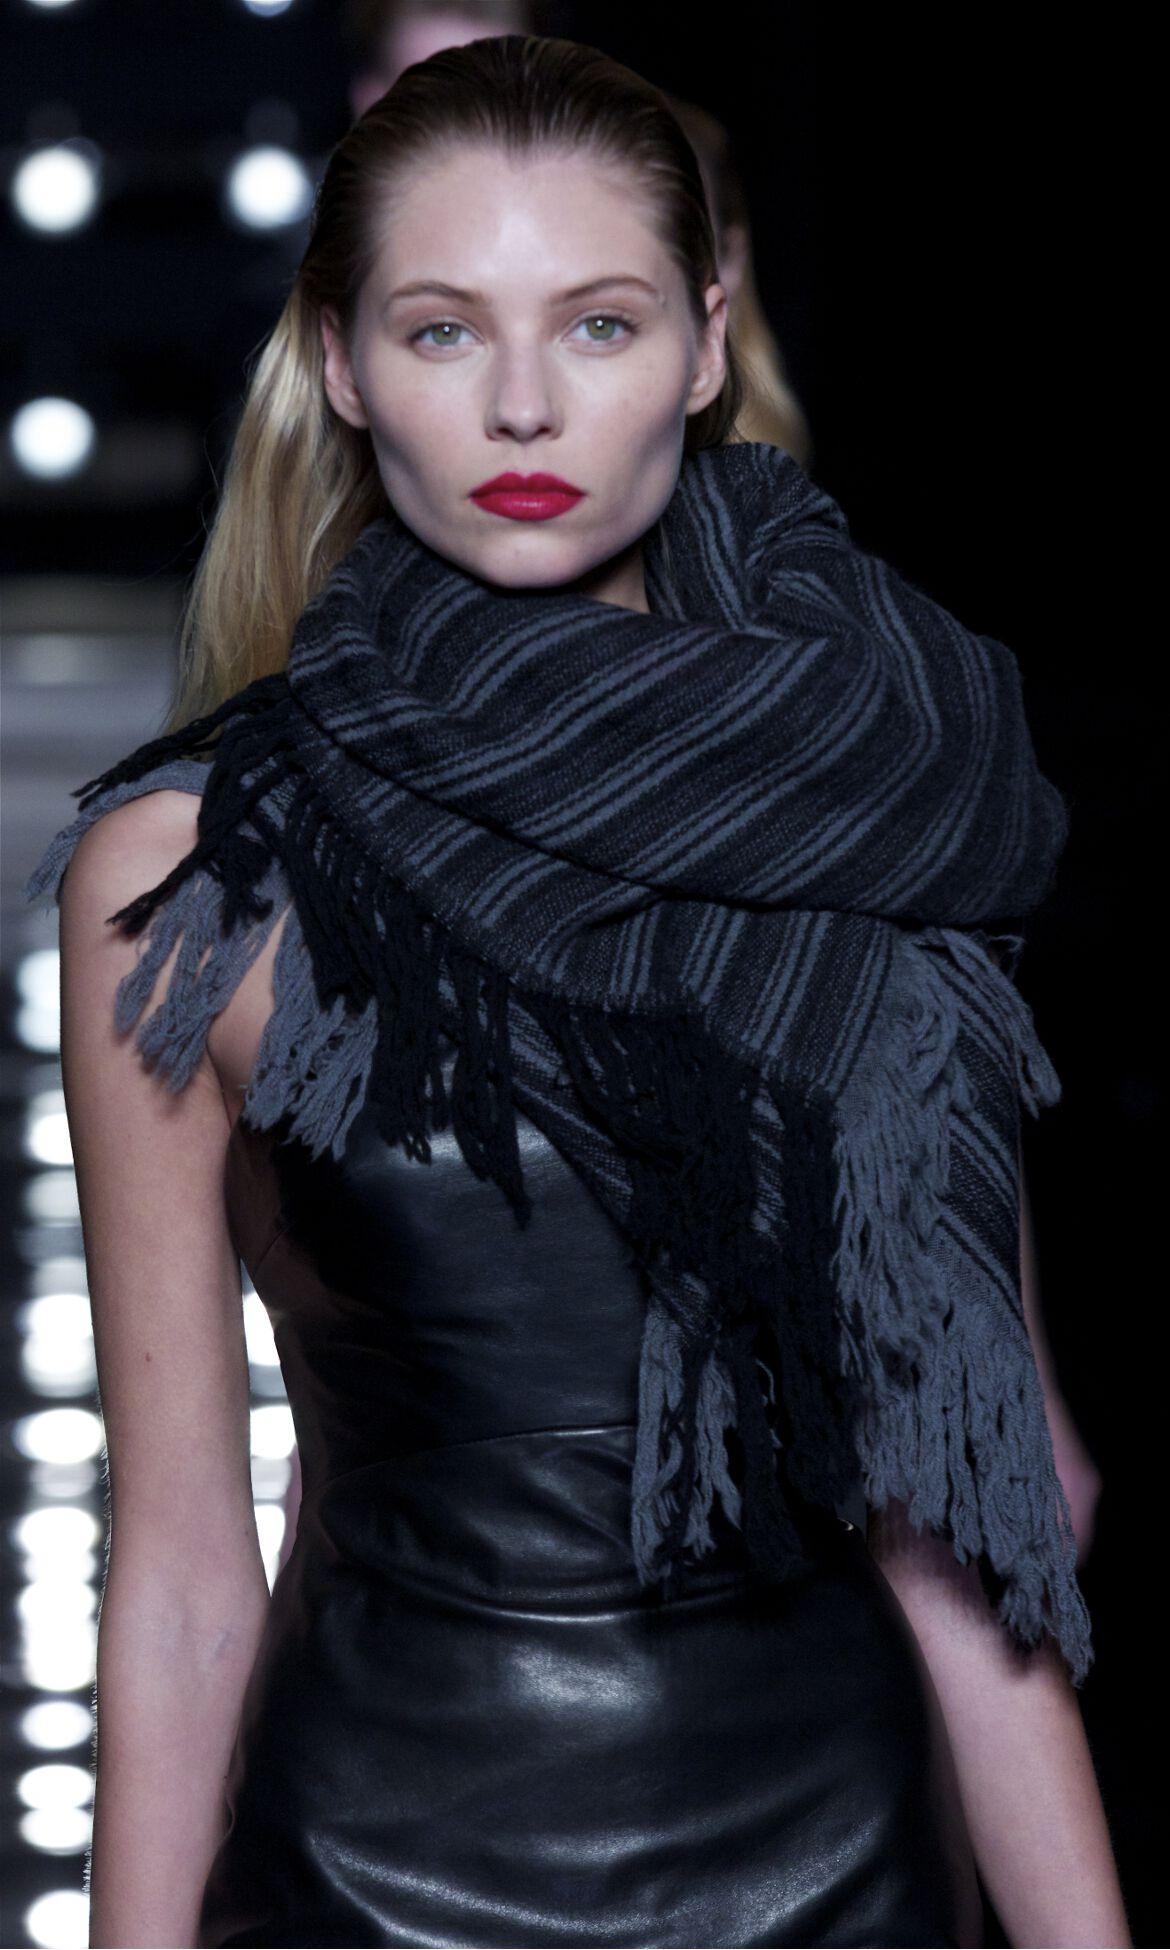 Ermanno Scervino Fashion Trends Model Detail